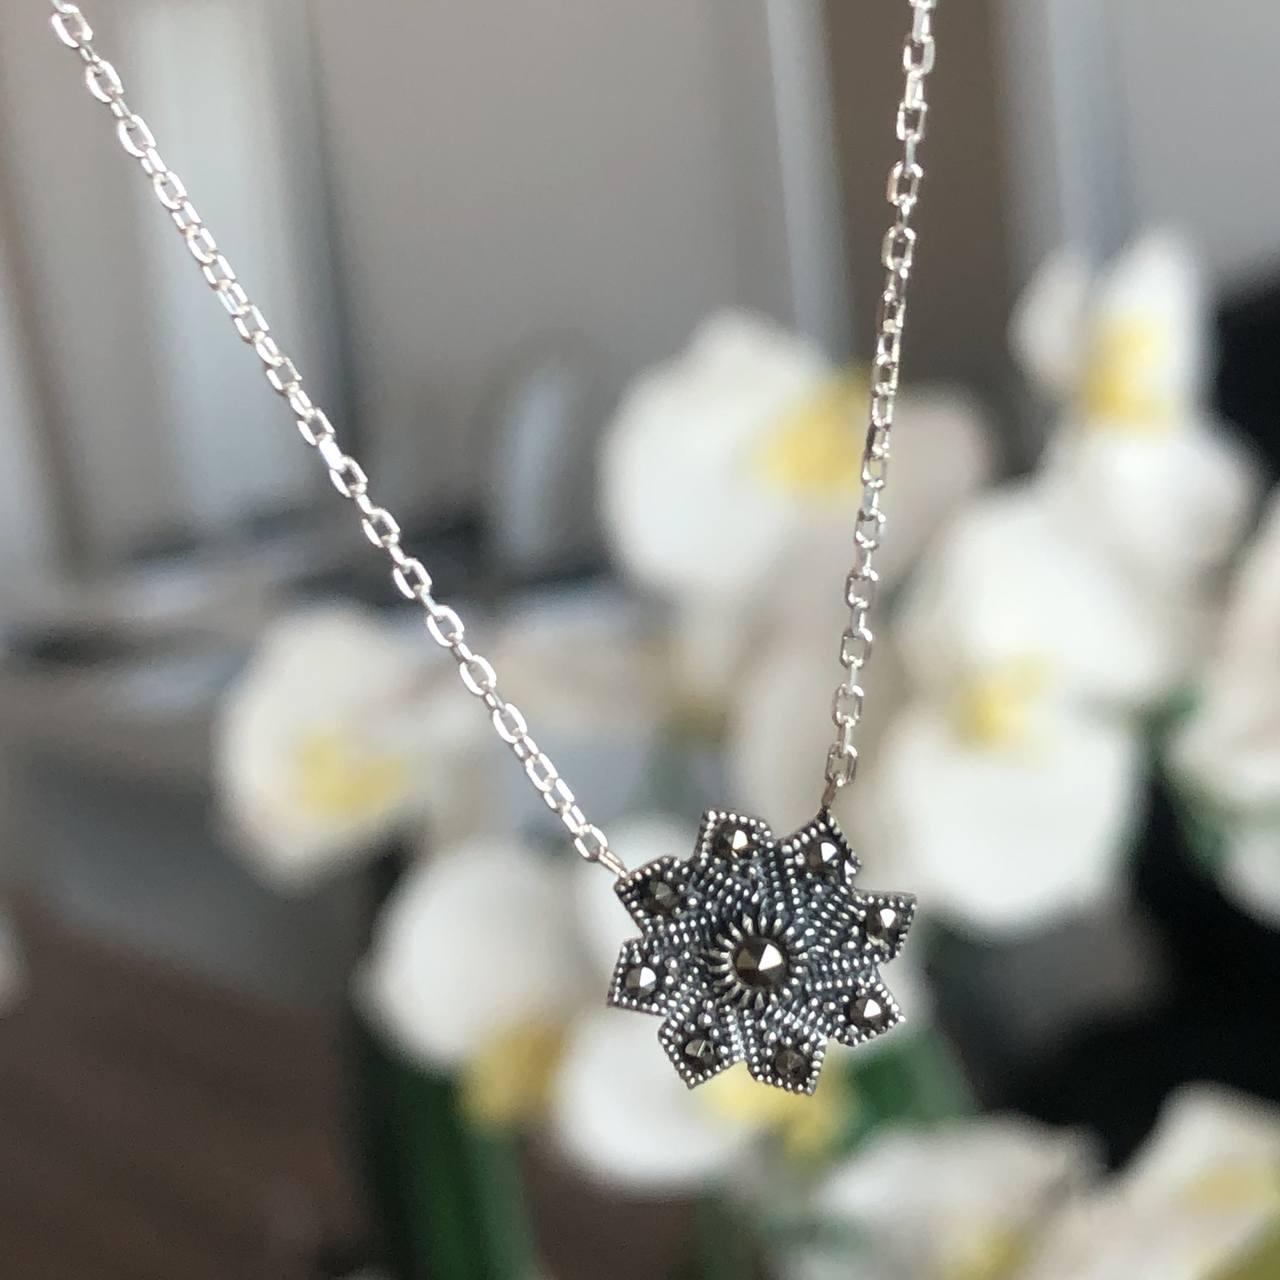 Colar de prata 925 gargantilha flor marcassita